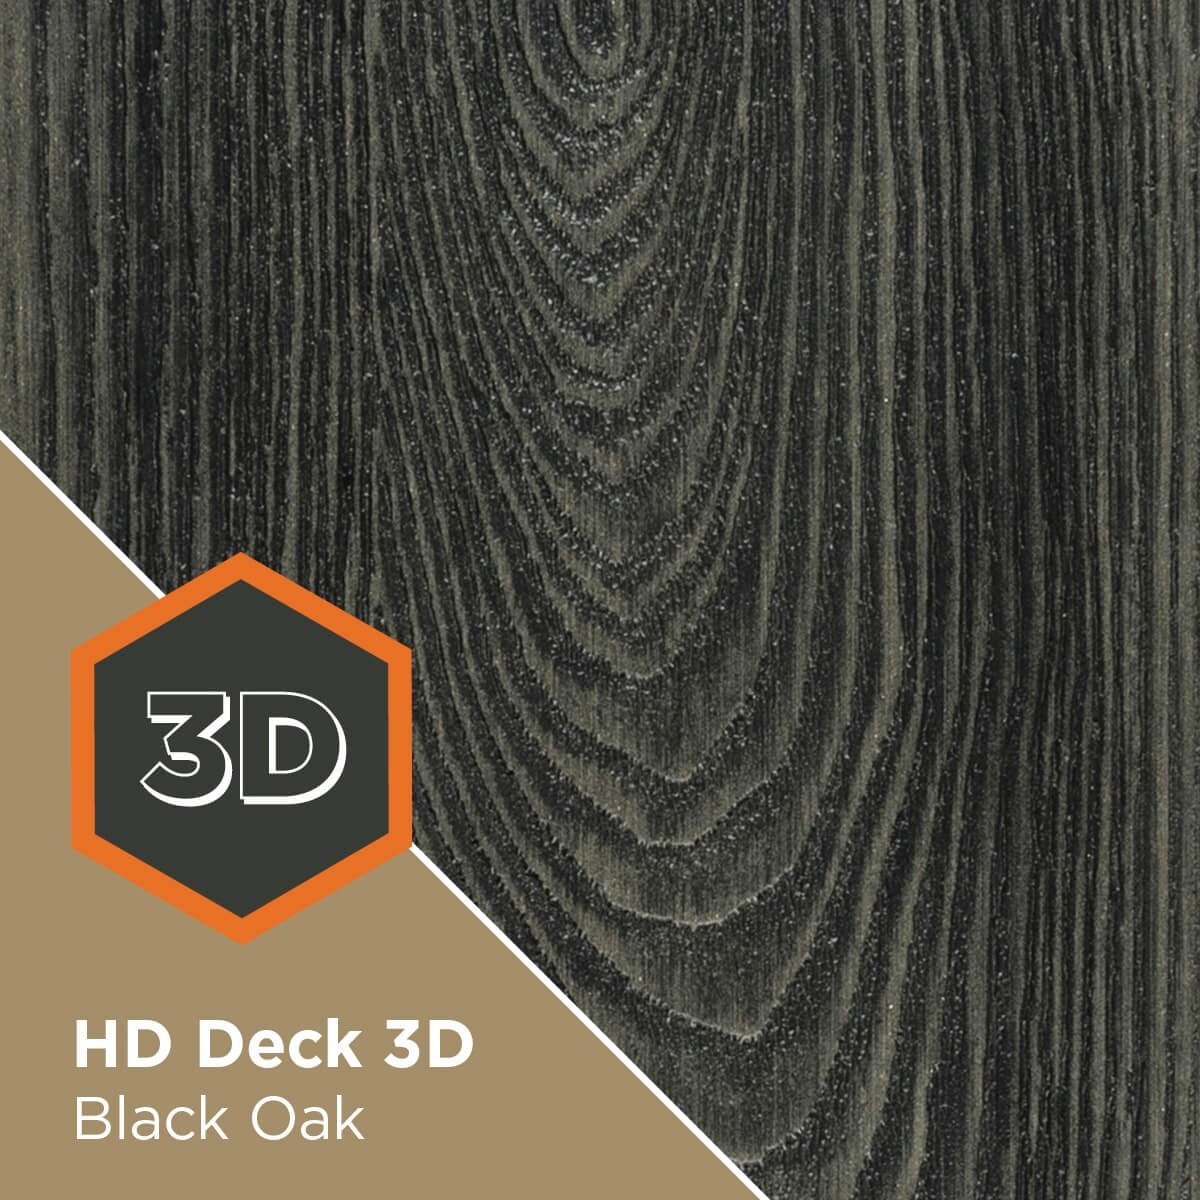 HD Deck 3D Black Oak